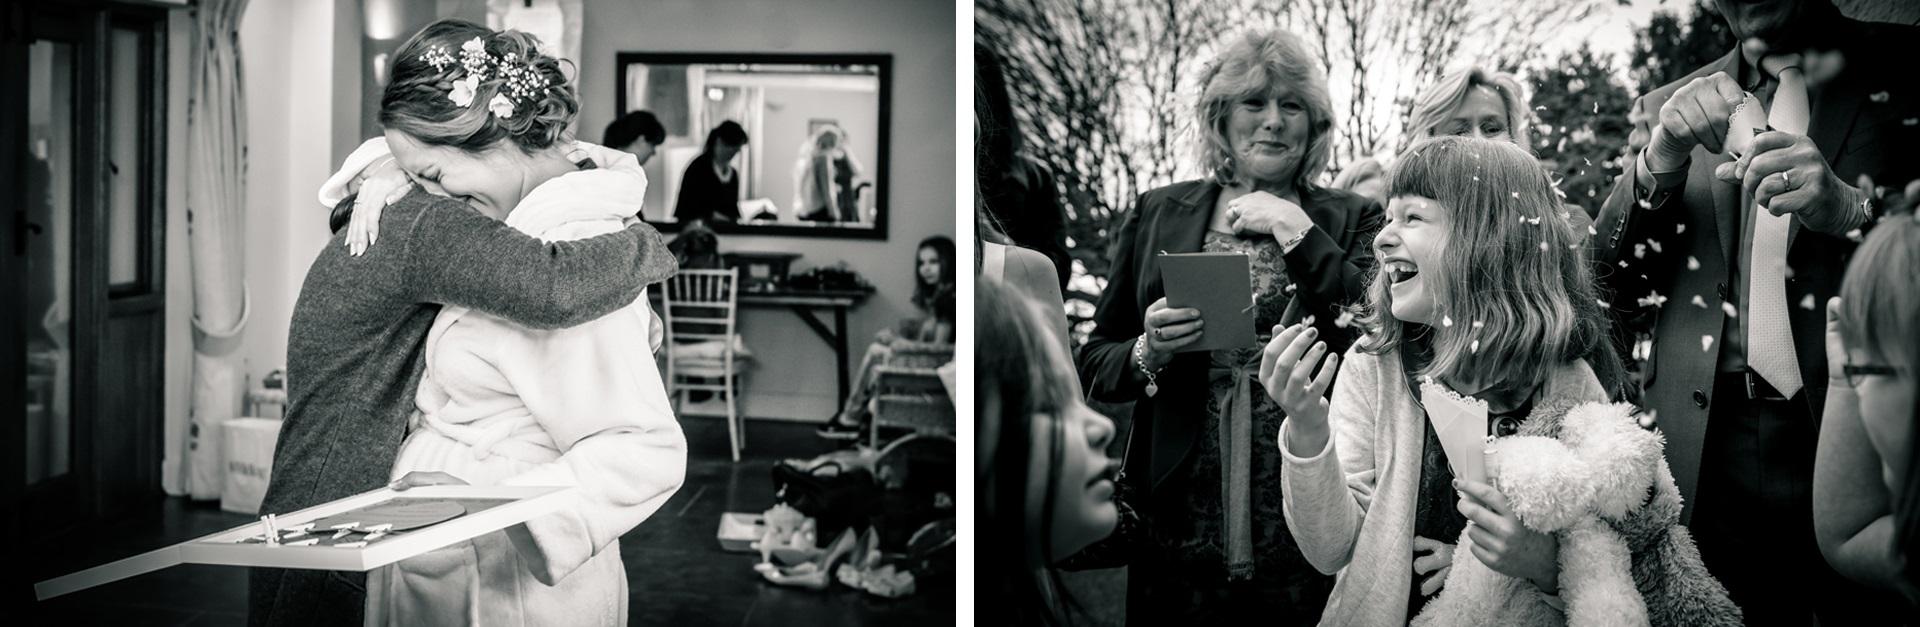 Warwickshire-wedding-photographer-chris-fossey-1